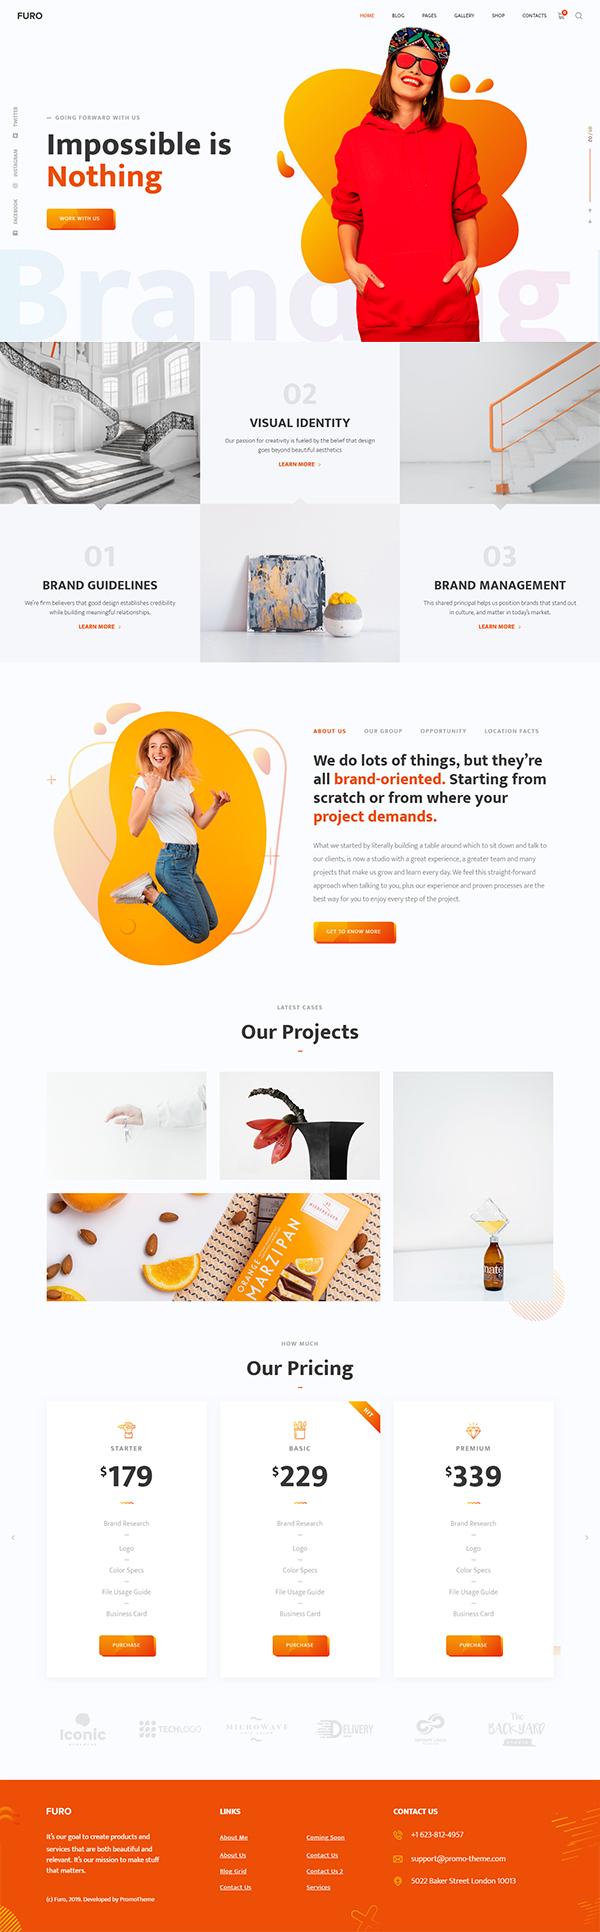 Furo - A Creative MultiPurpose WordPress Theme